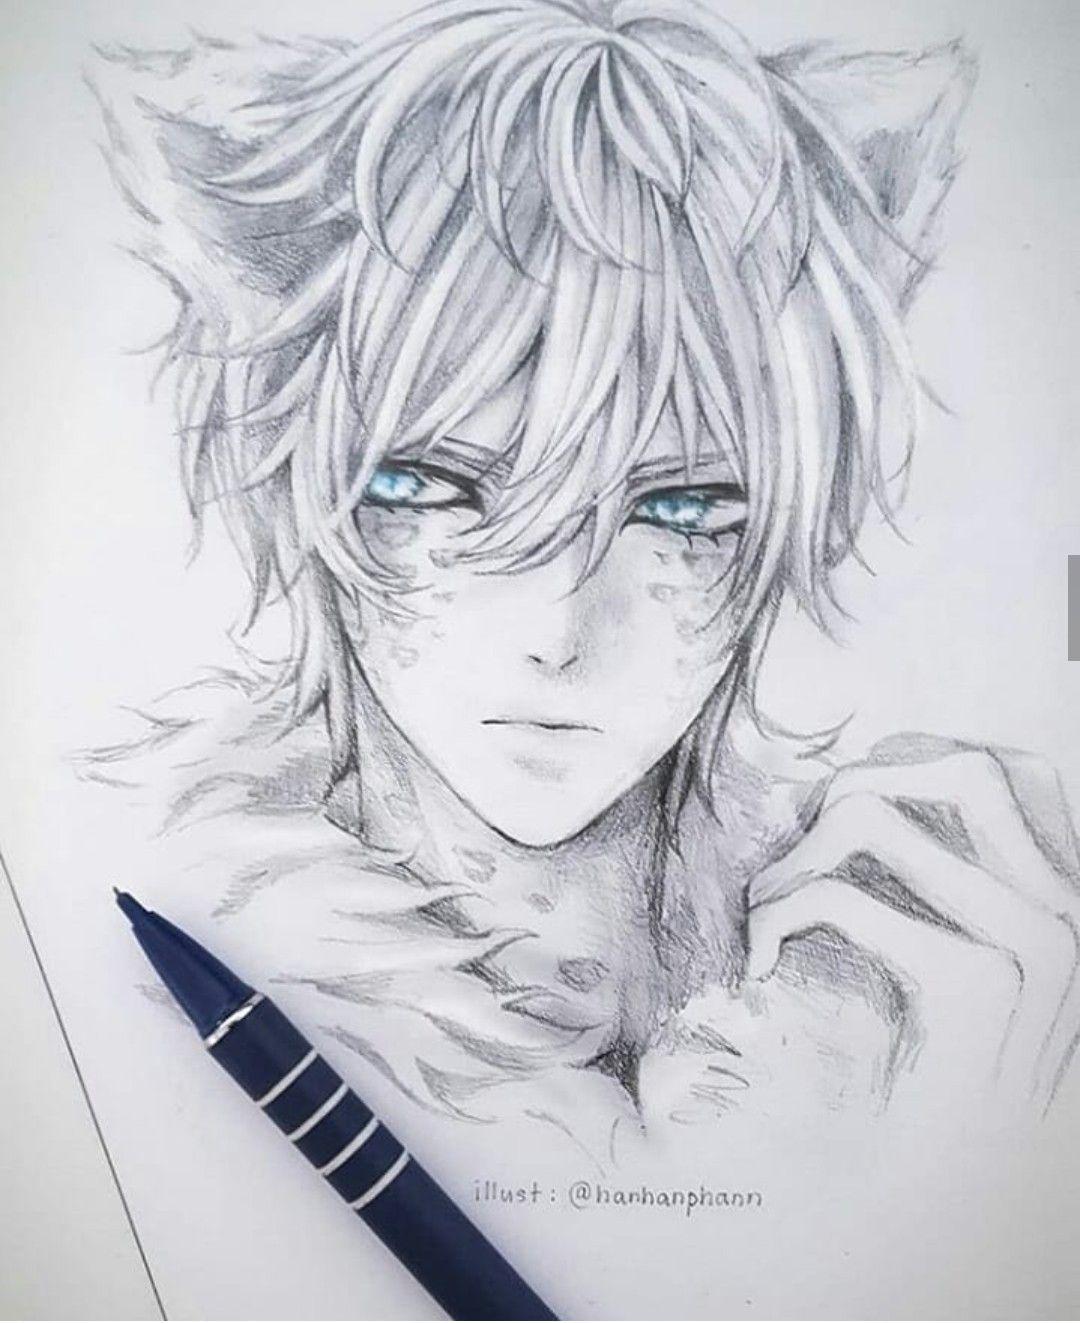 Pin By Gozheman Radmila On Drawings Manga Drawing Tutorials Anime Drawings Boy Drawings